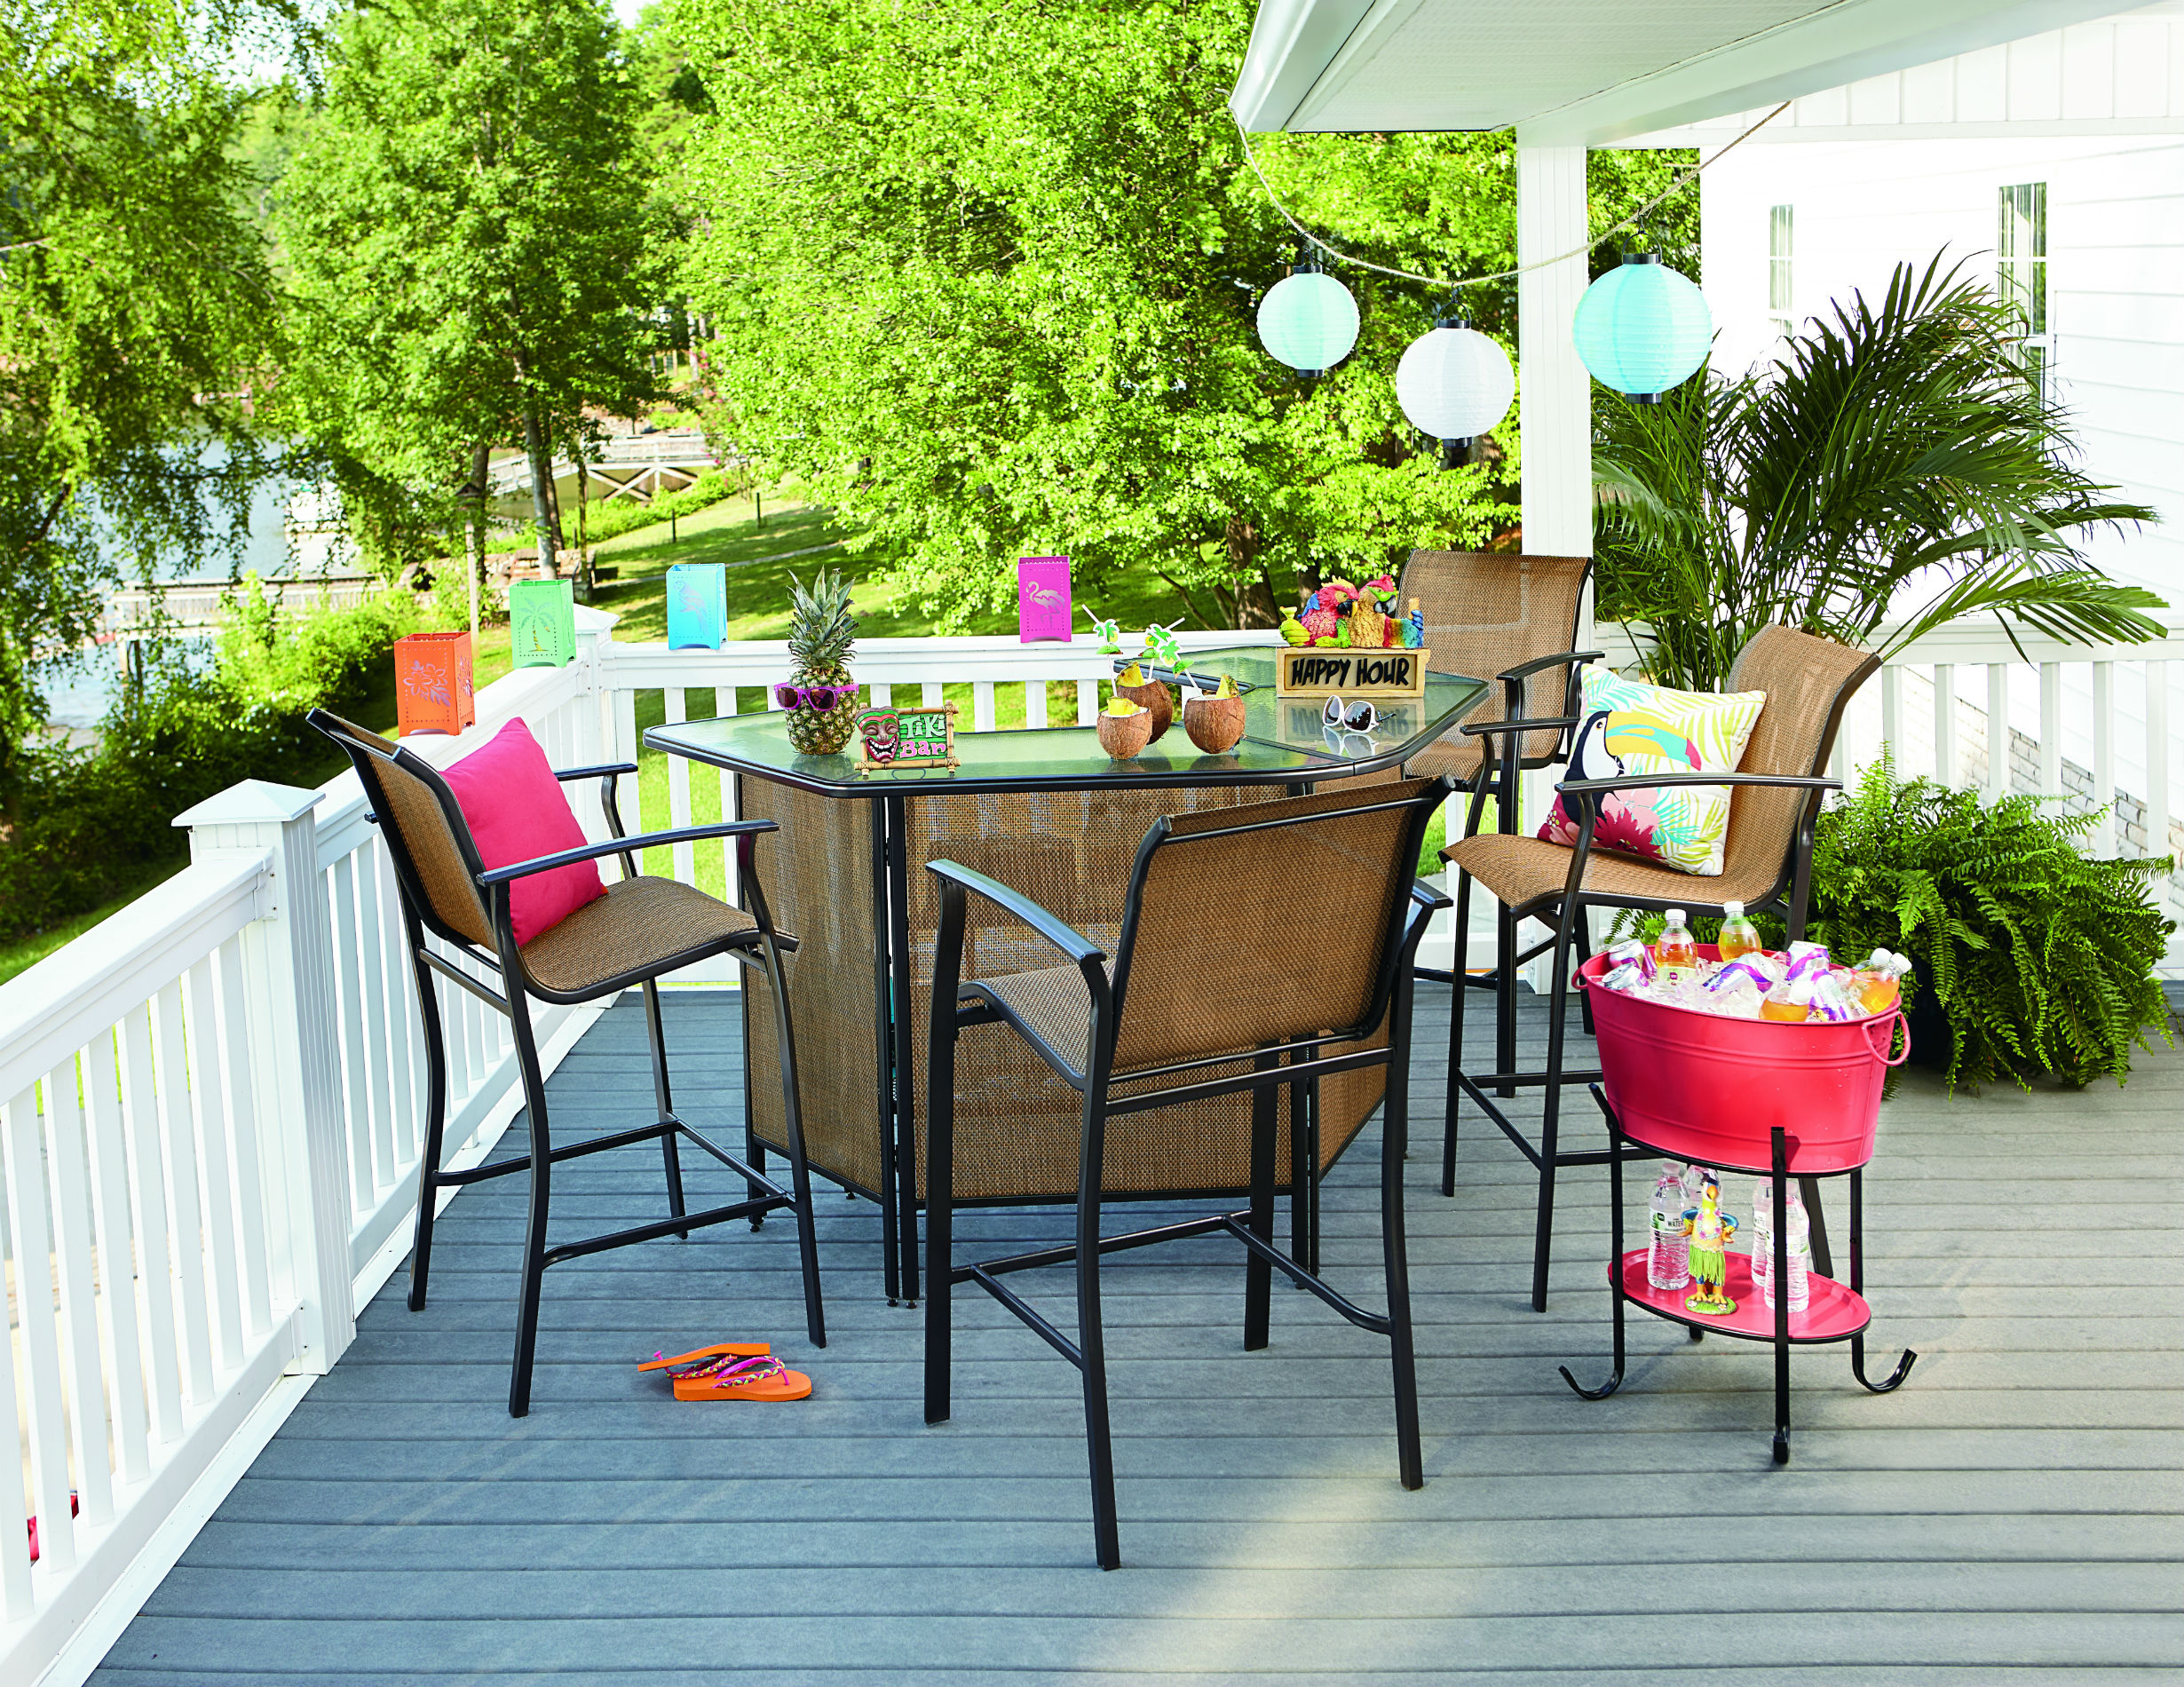 essential garden fulton 5-piece patio bar set *limited availability MKAFEAT